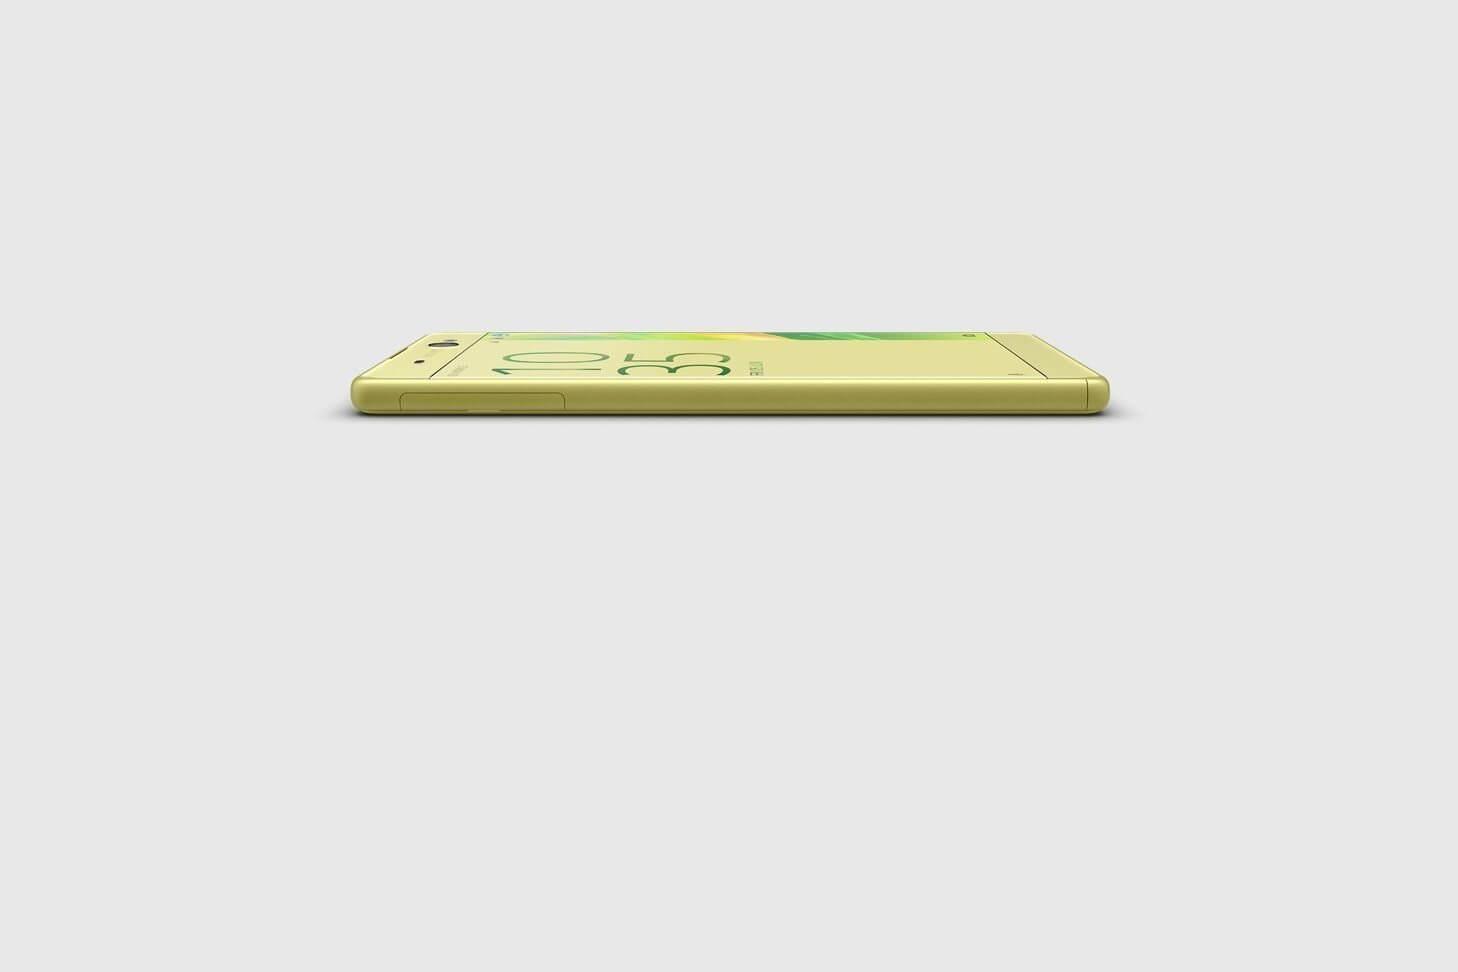 smt sony xperia xa ultra p06 - Sony apresenta Xperia XA Ultra, seu phablet bom de selfie